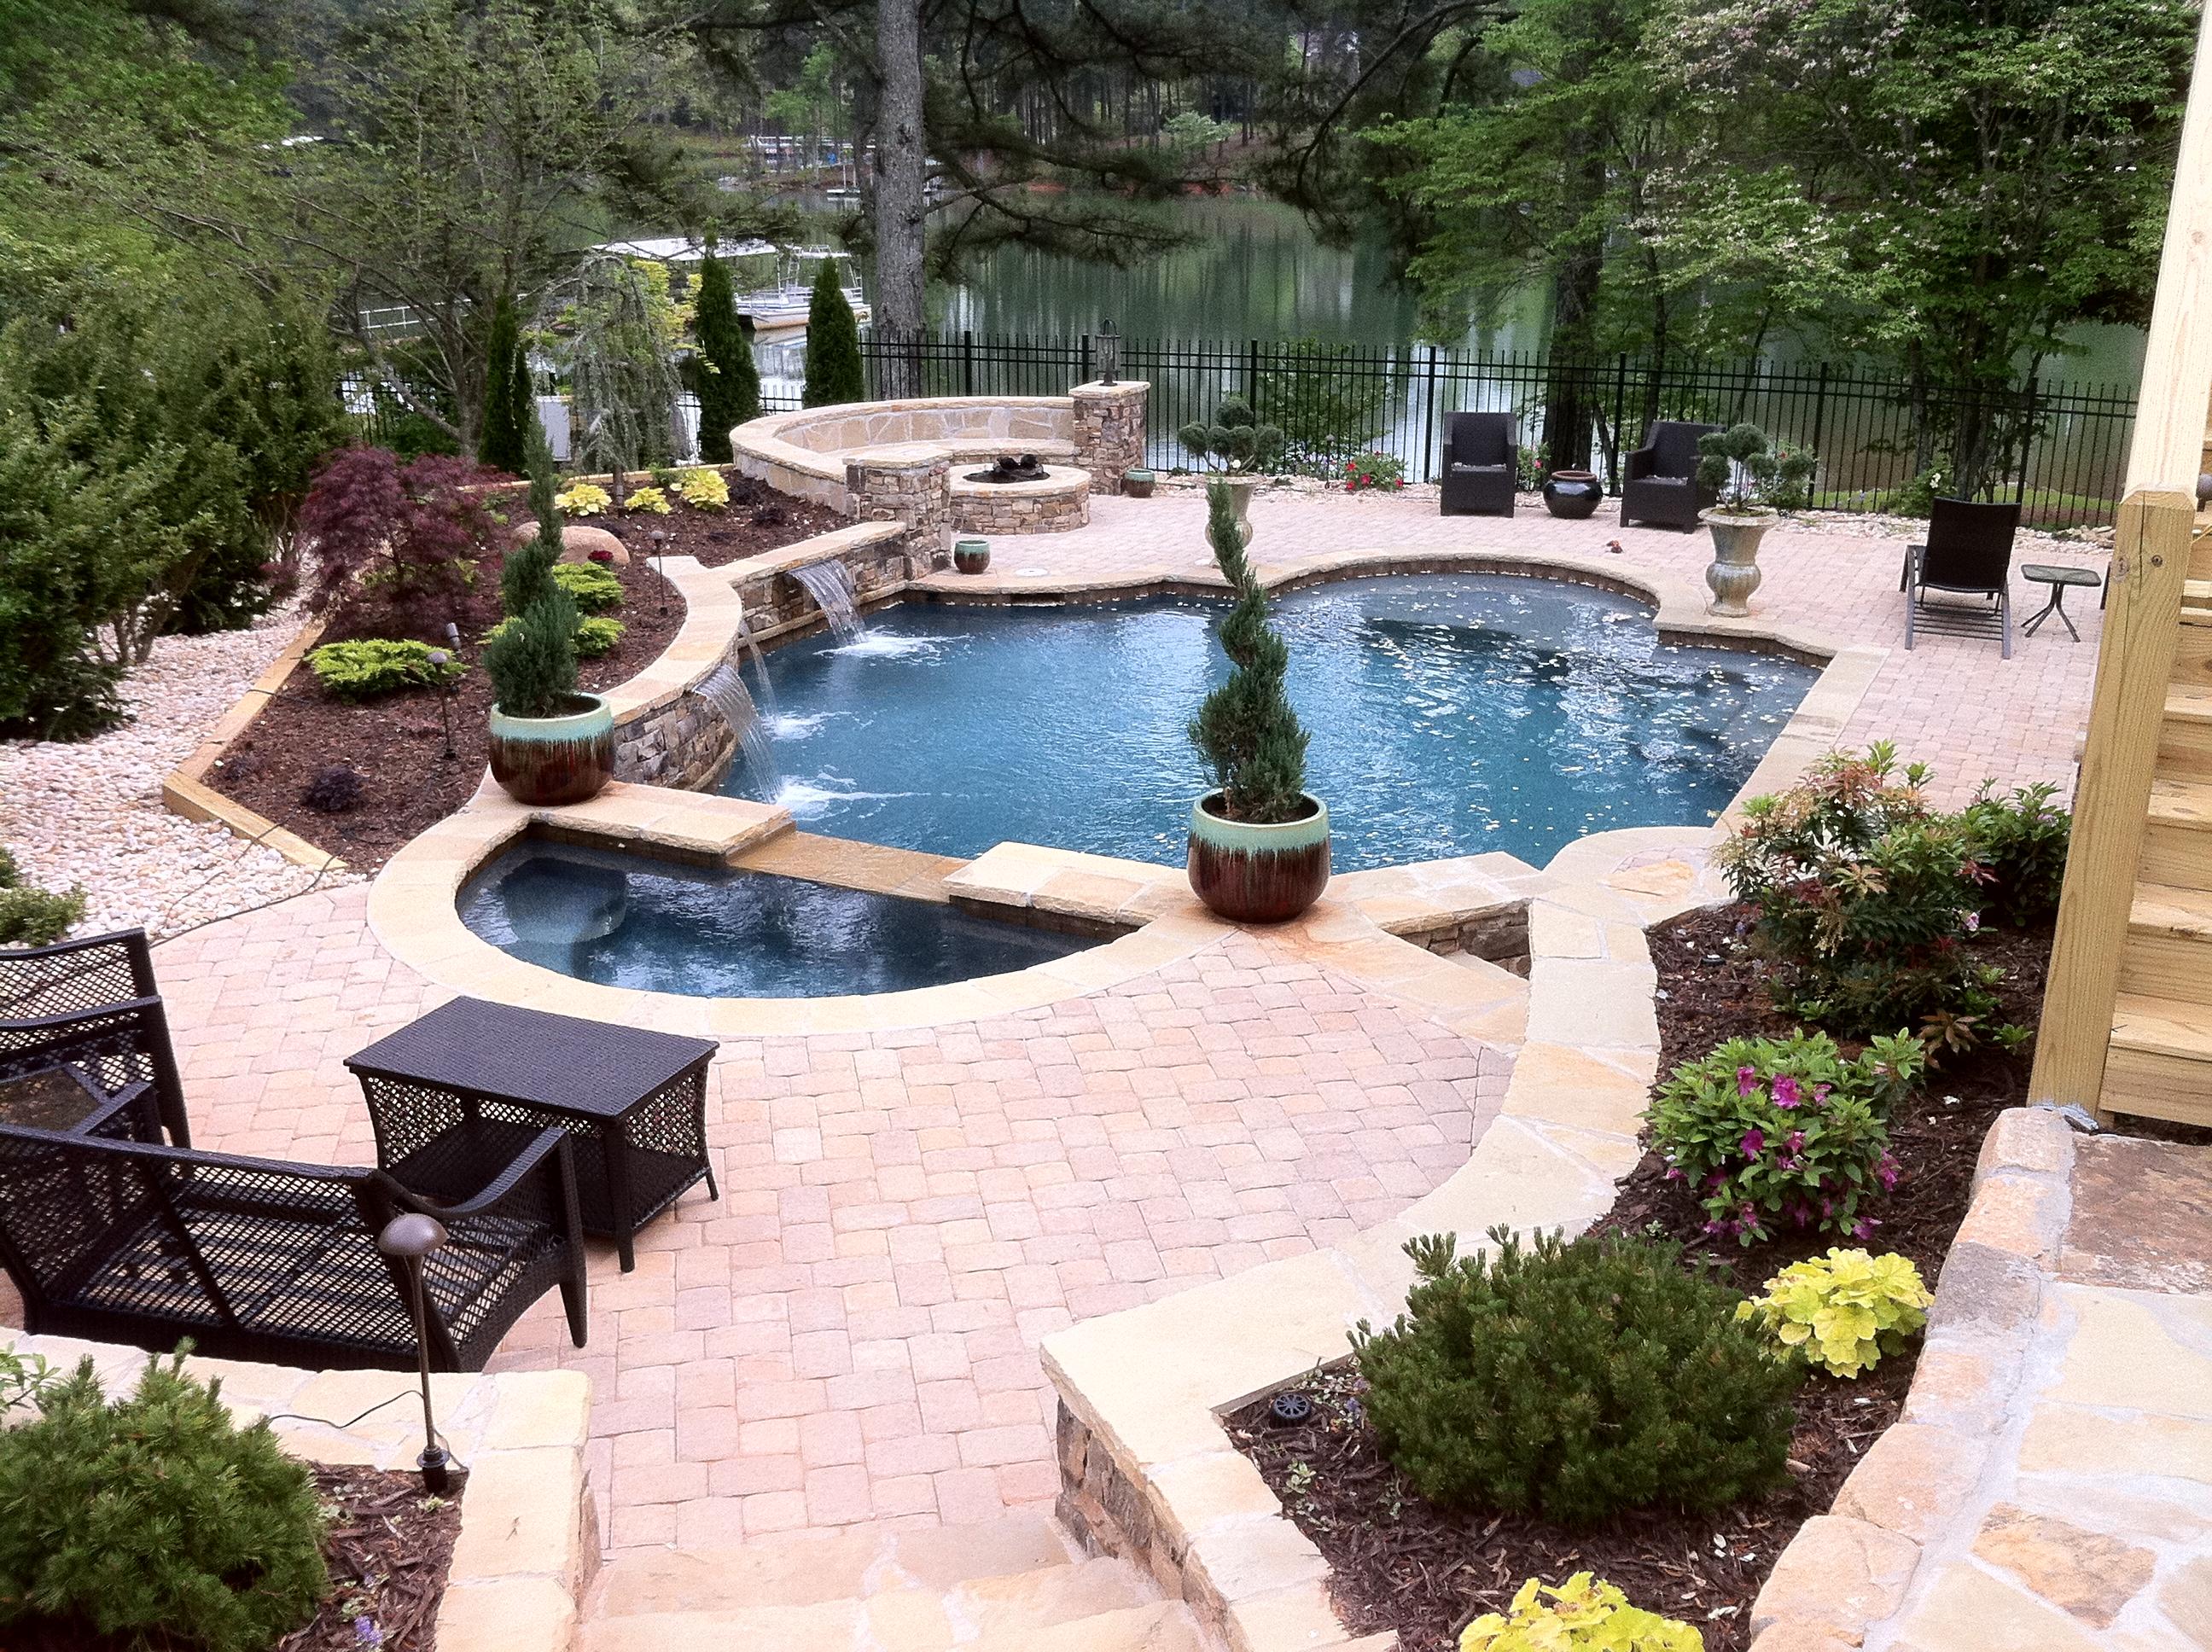 Aqua design pools spas llc coupons near me in cumming for Pool design near me